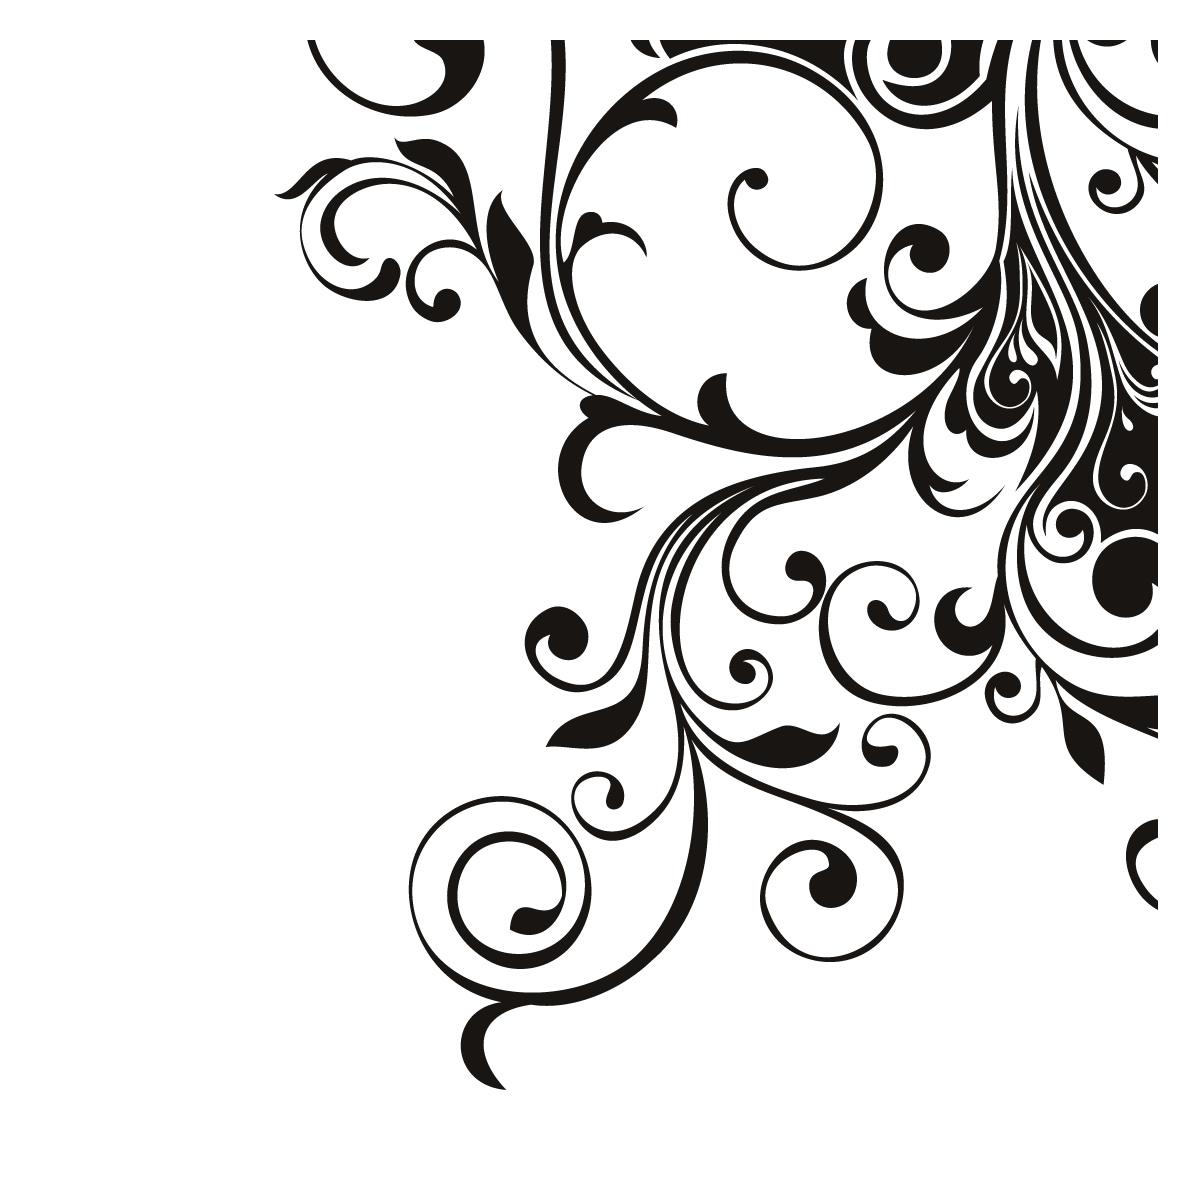 Free Decorative Designs Cliparts, Download Free Clip Art